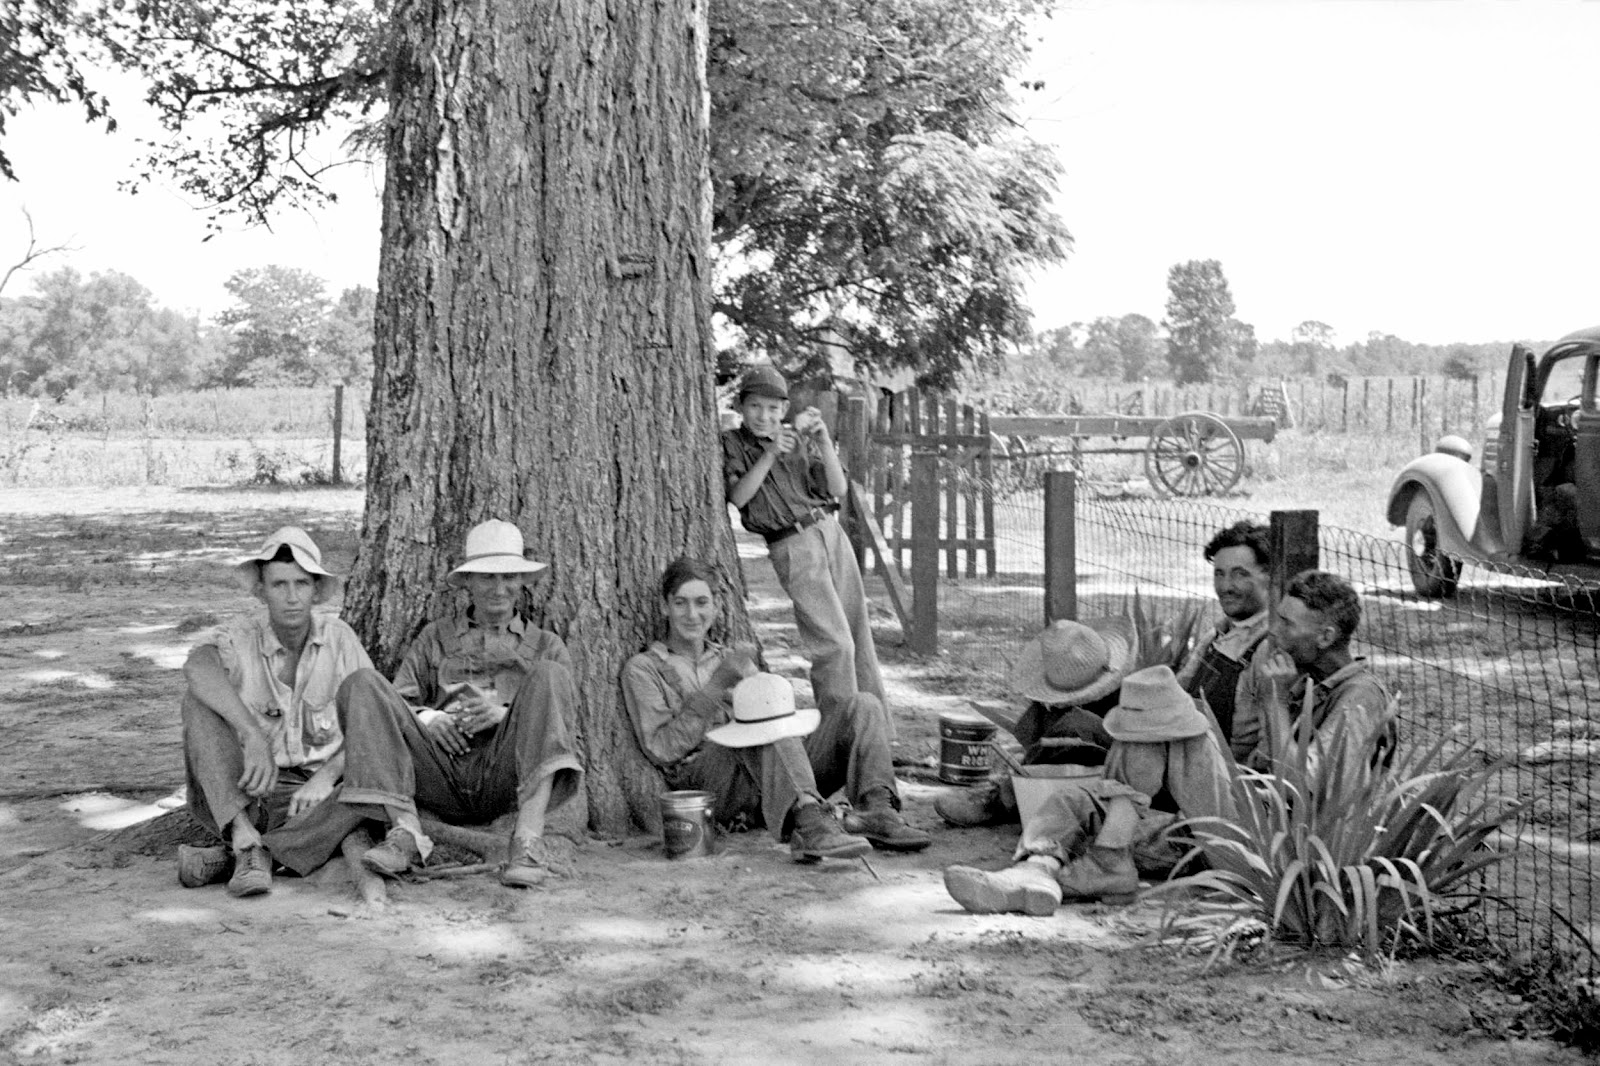 History in Photos: Arthur Rothstein  Cotton Plantations 1800s